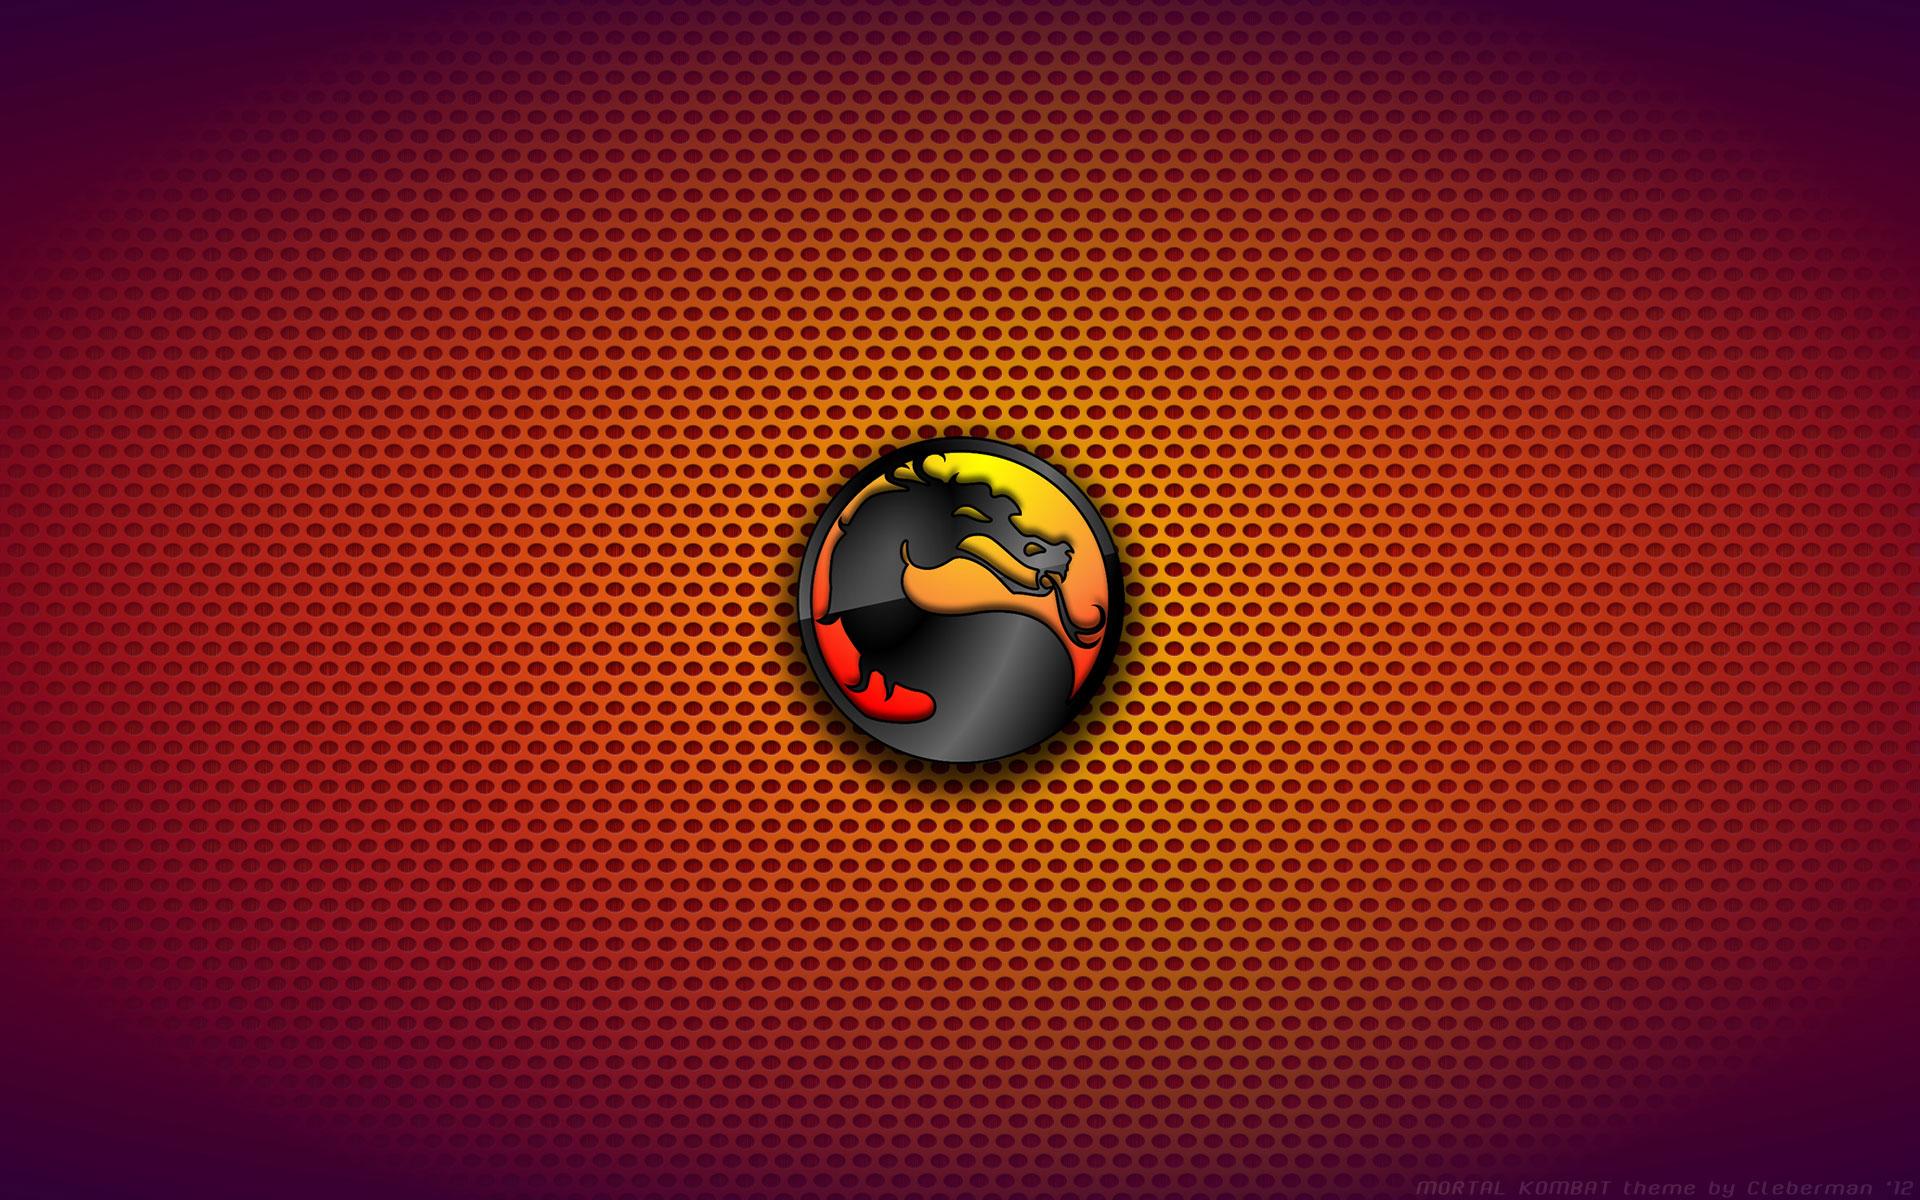 Wallpaper Mortal Kombat Logo Immagini 1920x1200